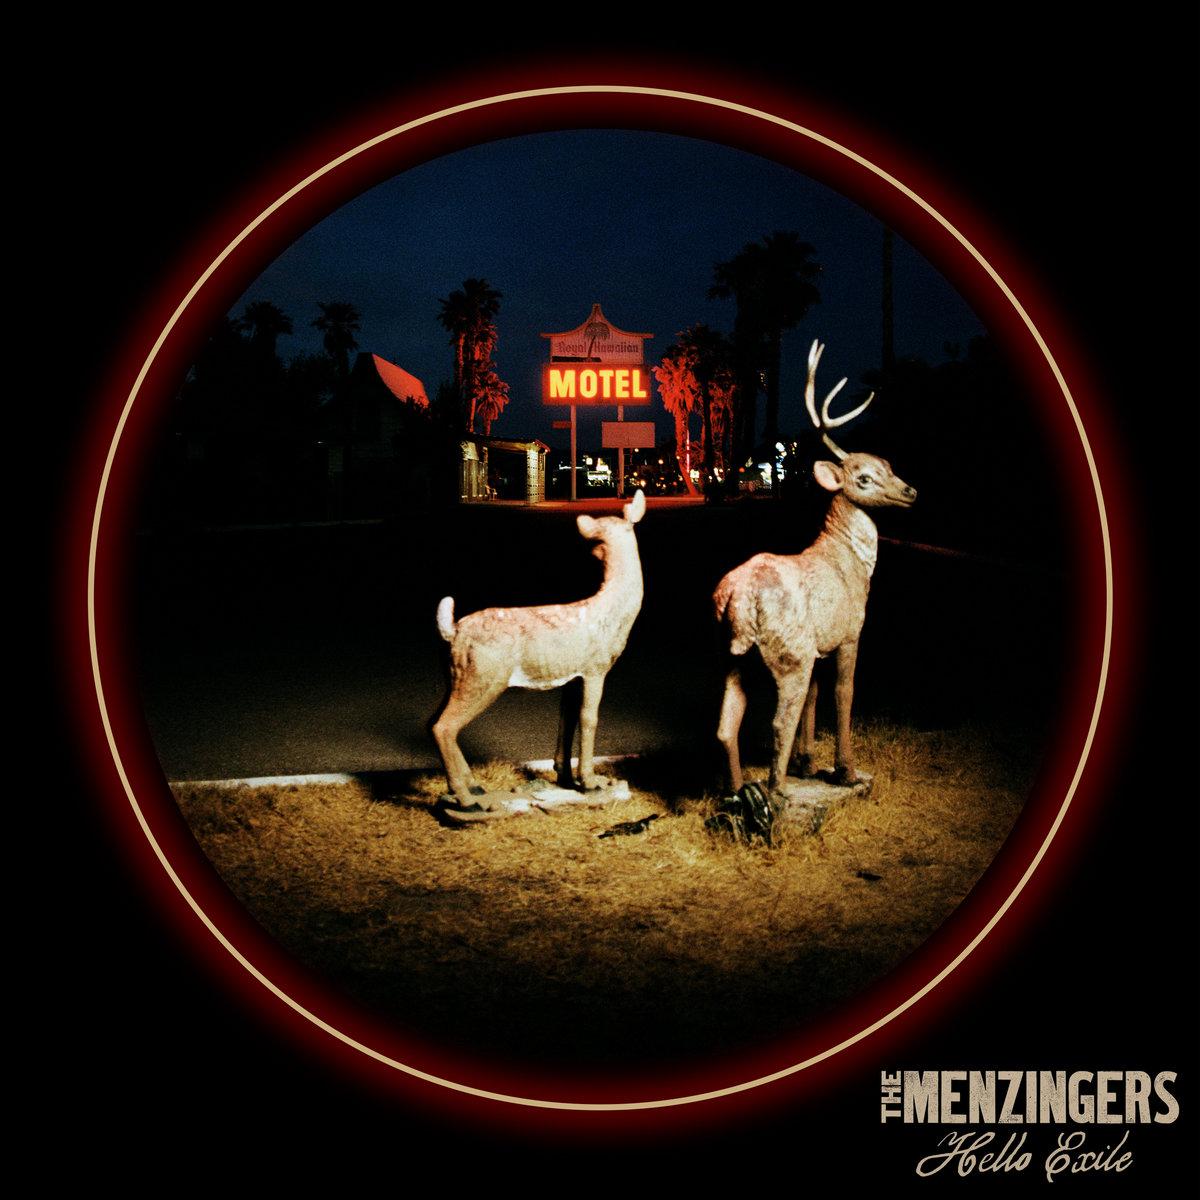 Menzingers - Hello Exile Limited Edition Coloured Vinyl